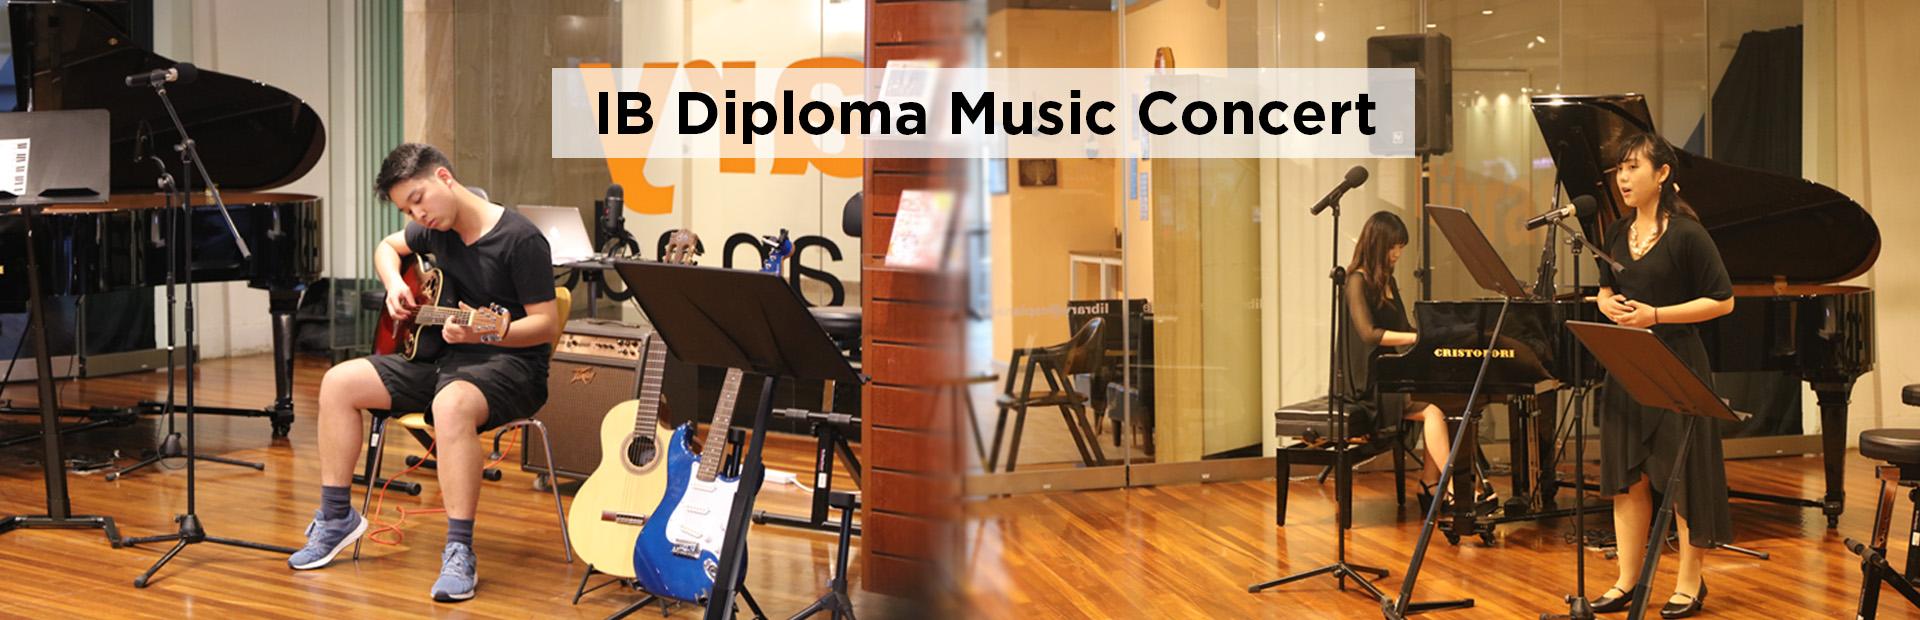 dp-concert-banner